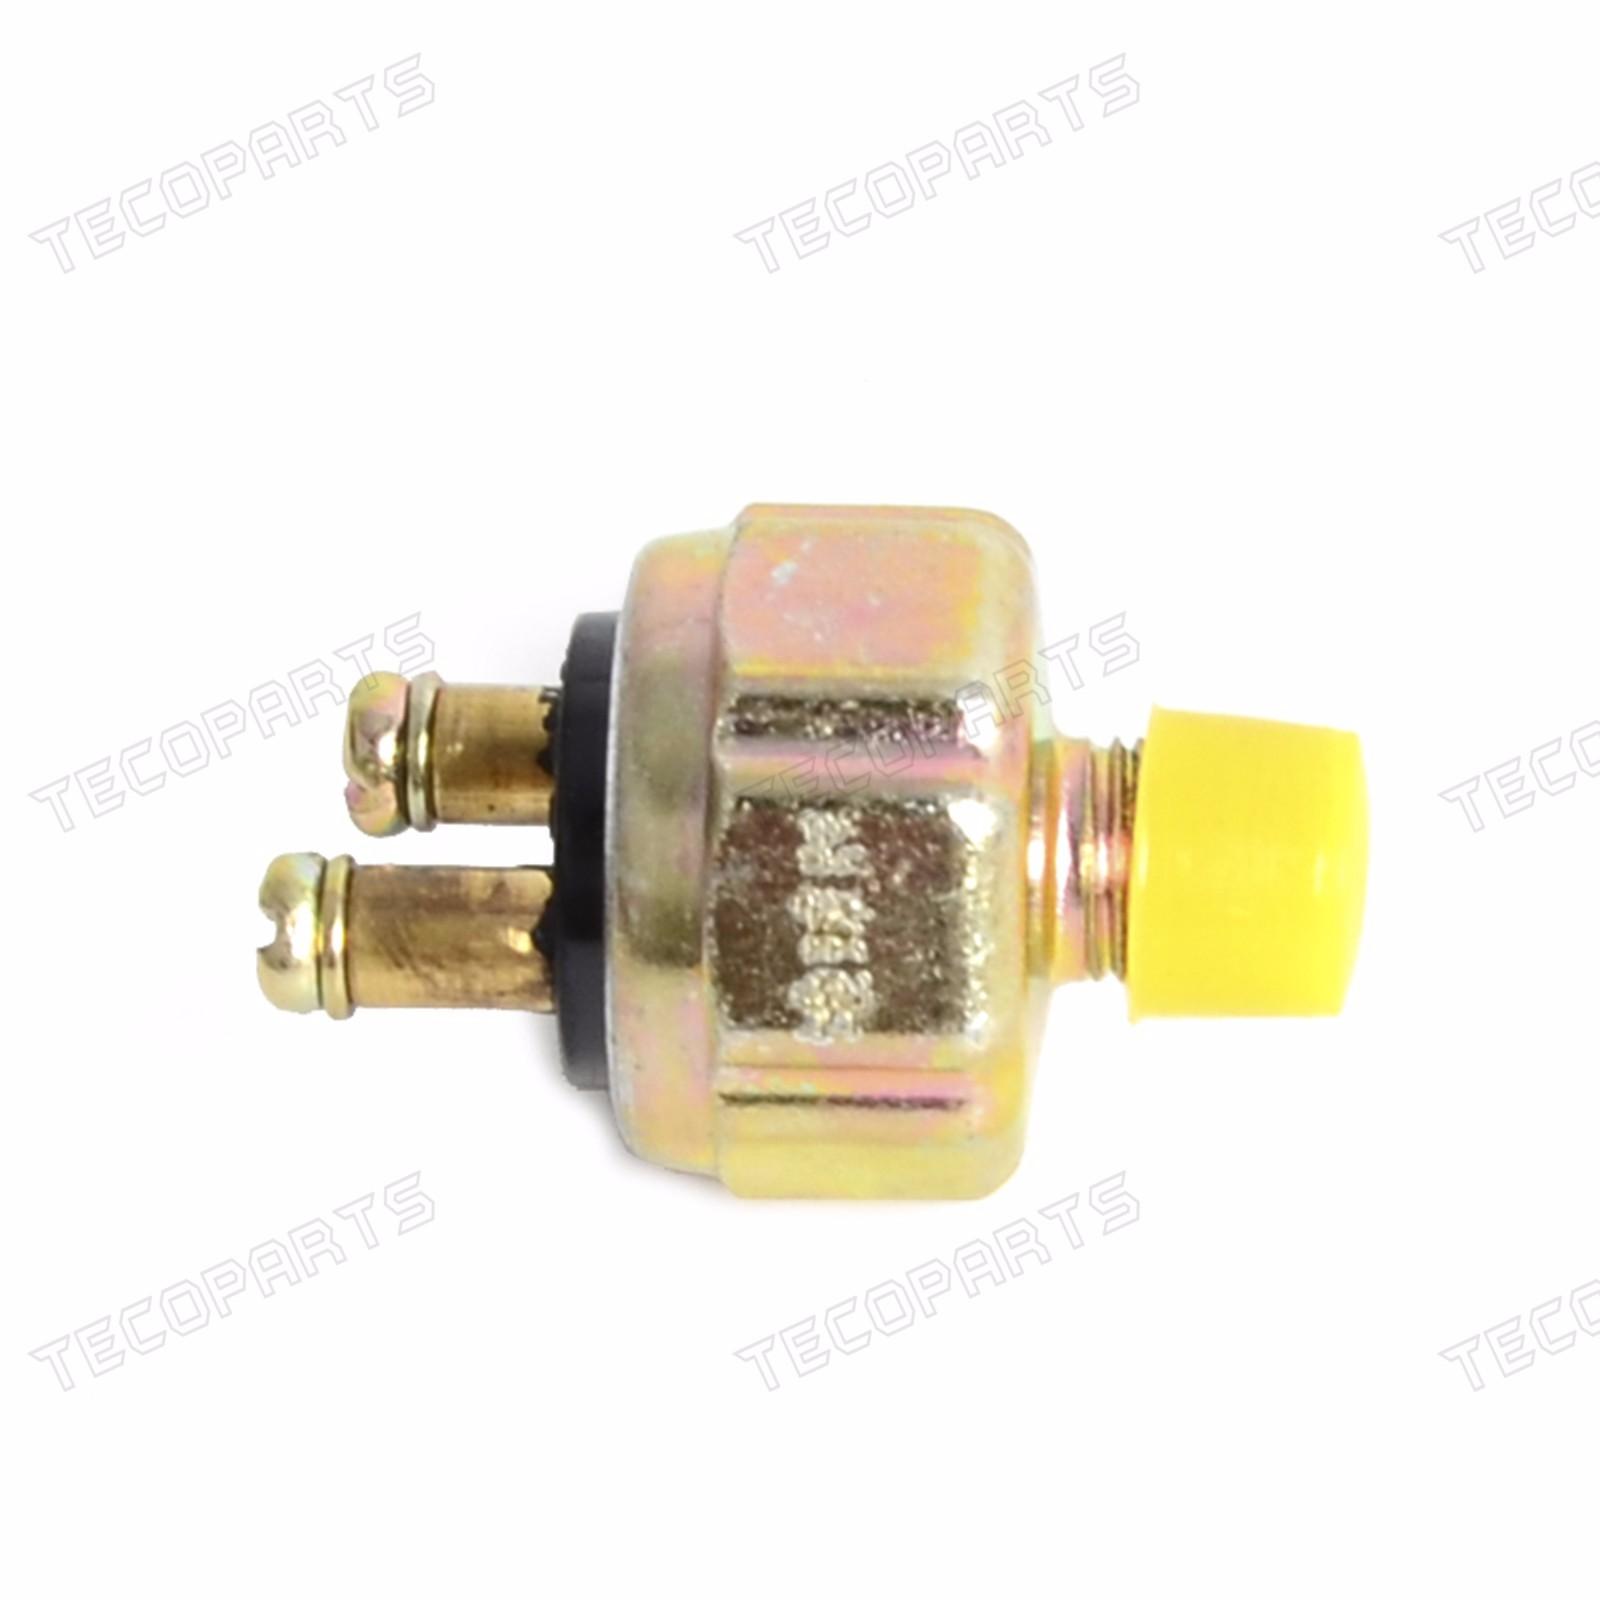 hight resolution of details about new utv brake stop light switch for 90 110 125 150 250 300cc go kart dune buggy